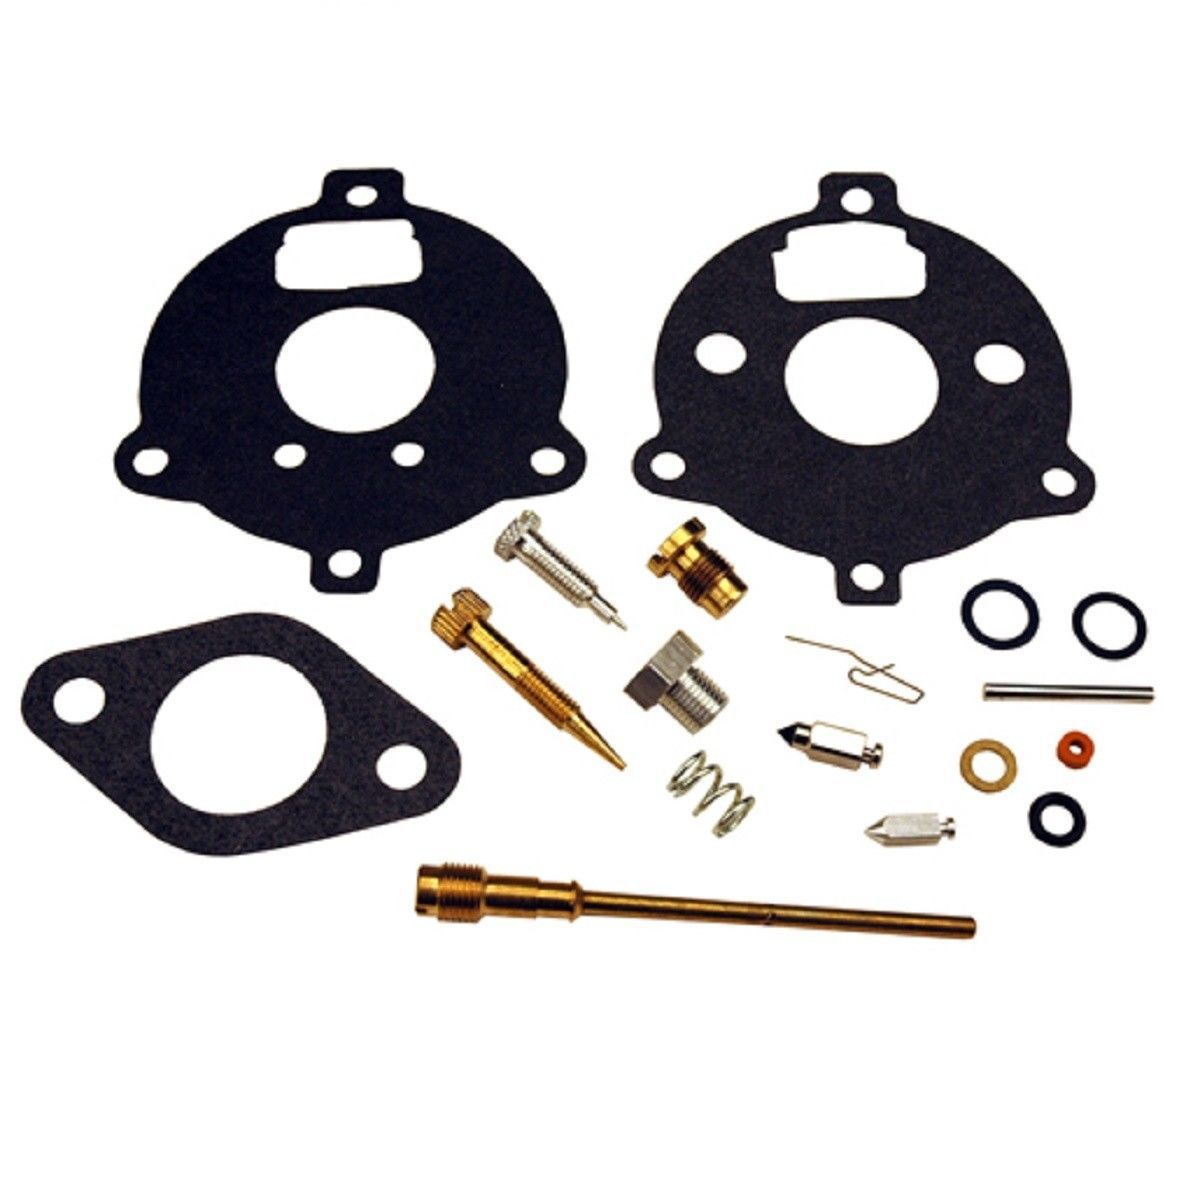 Carburetor Overhaul Kit Fits Briggs & Stratton 394693 295938 291763 398235 Carb